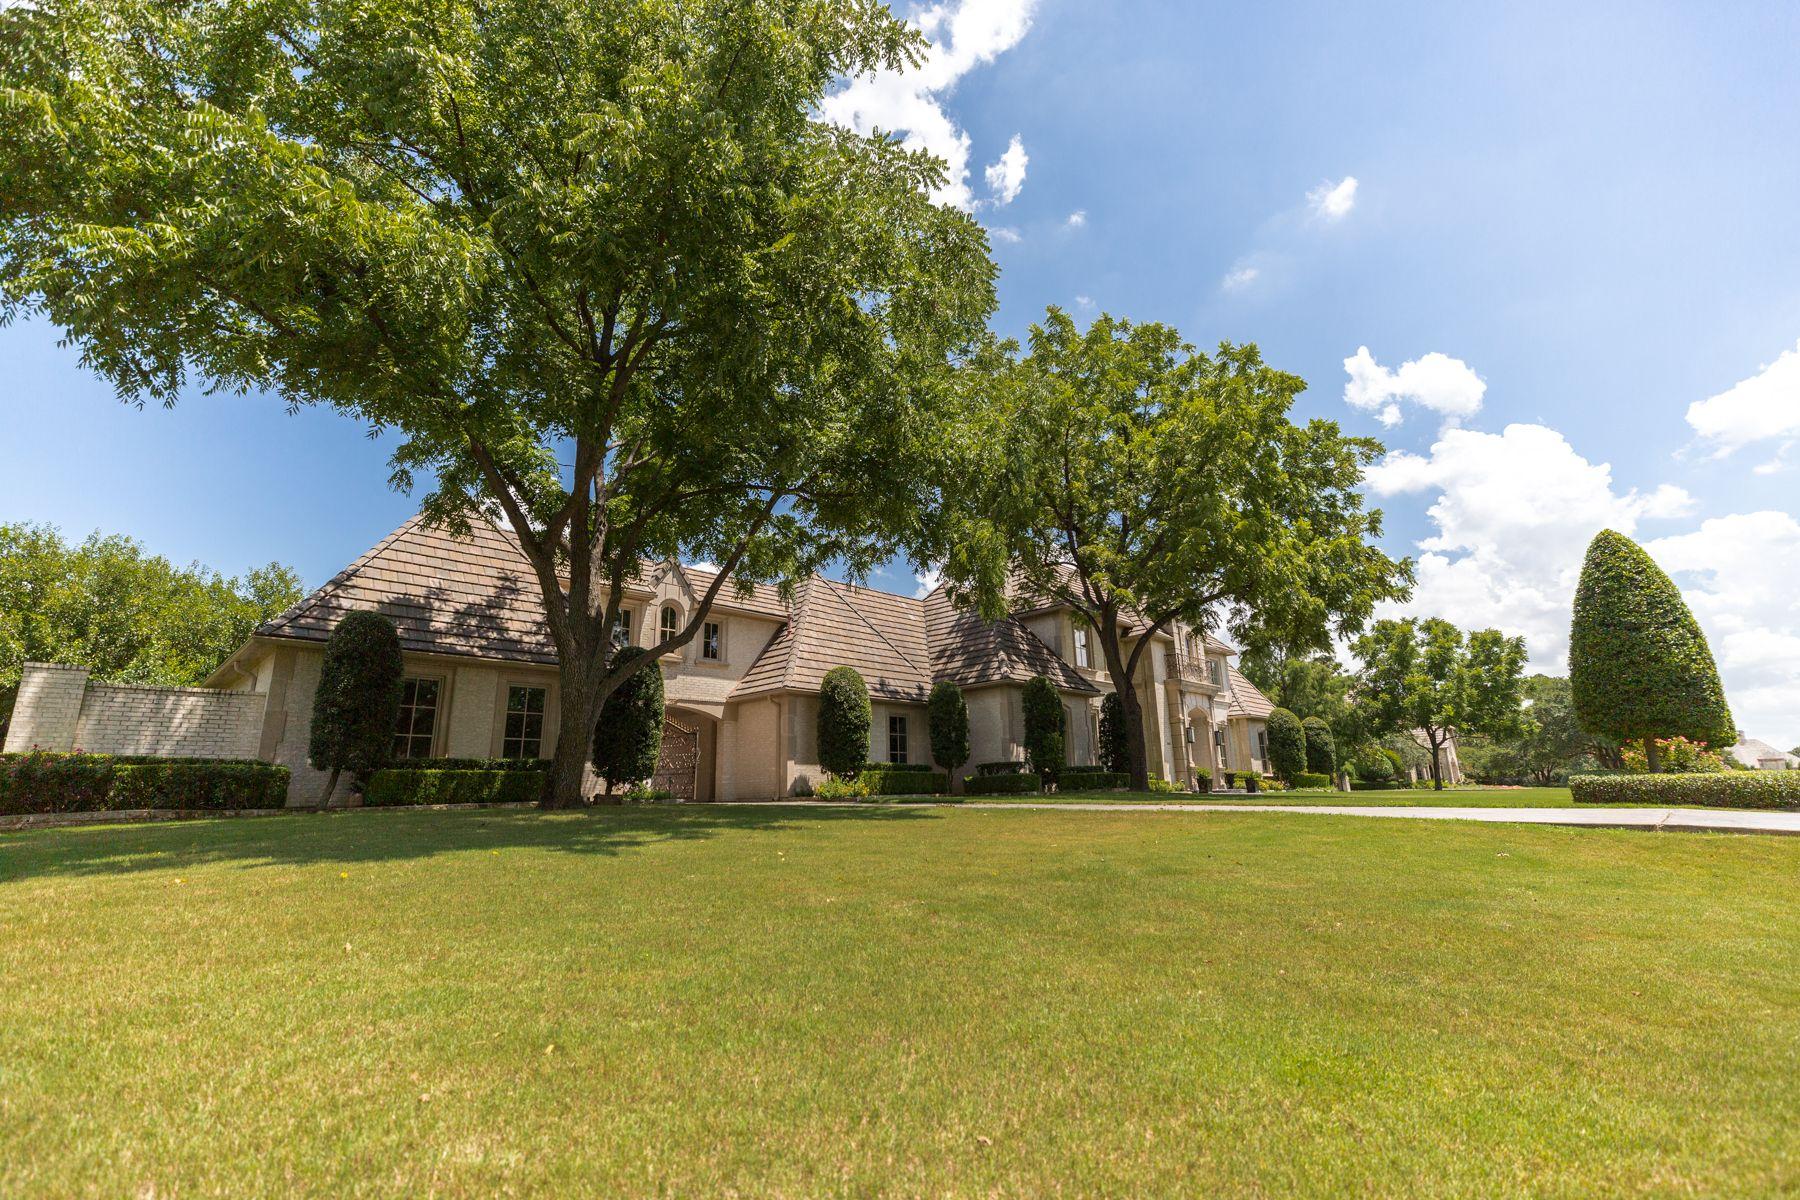 Lawn care in Texas